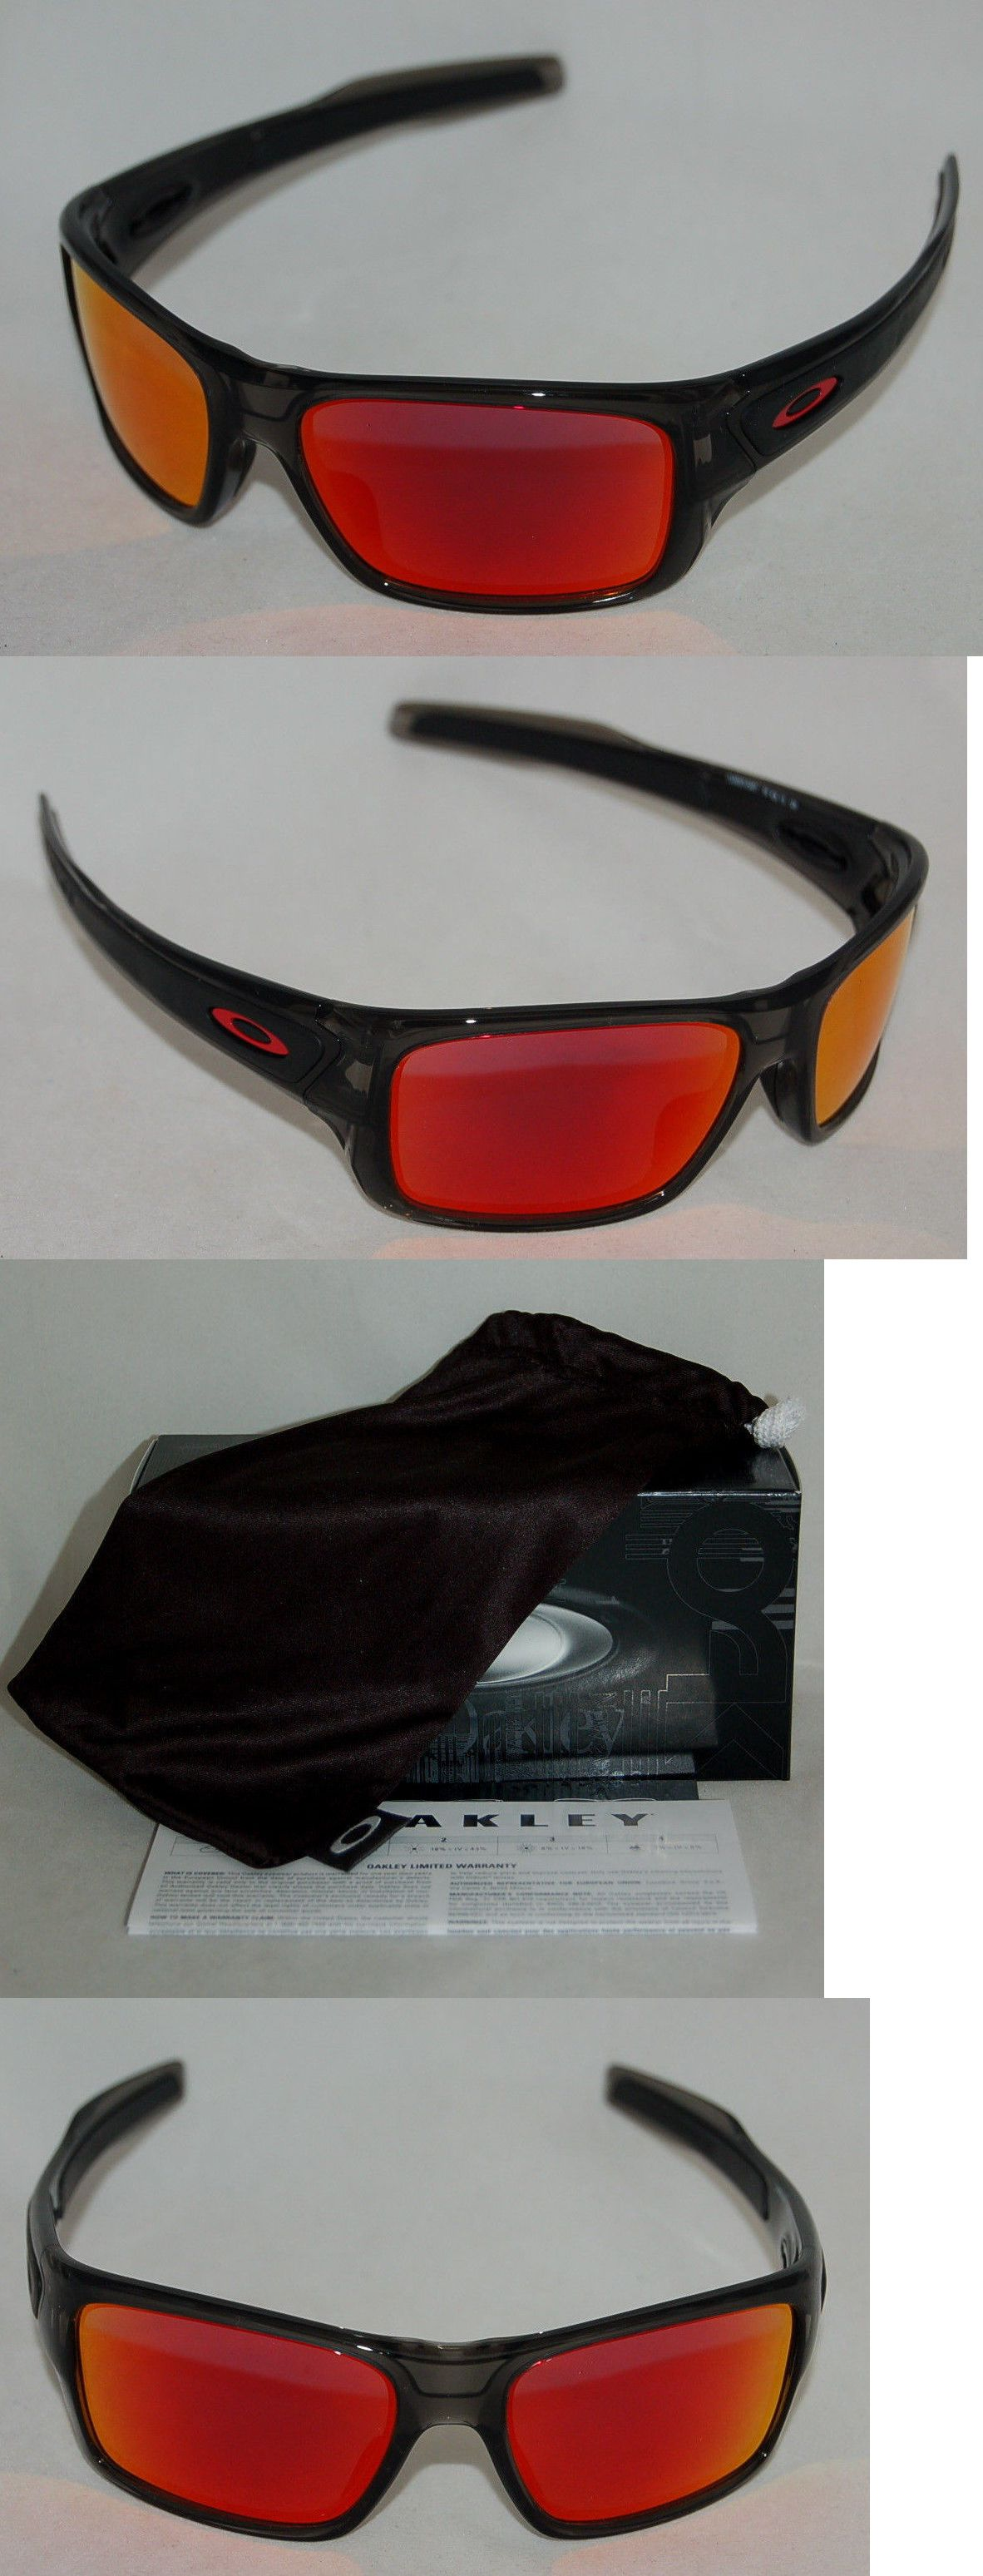 ab0ec65944466 Sunglass Lens Replacements 179194  New Oakley Turbine Xs Oj9003-0457 Youth  Fitgrey Smoke W Ruby Lens -  BUY IT NOW…